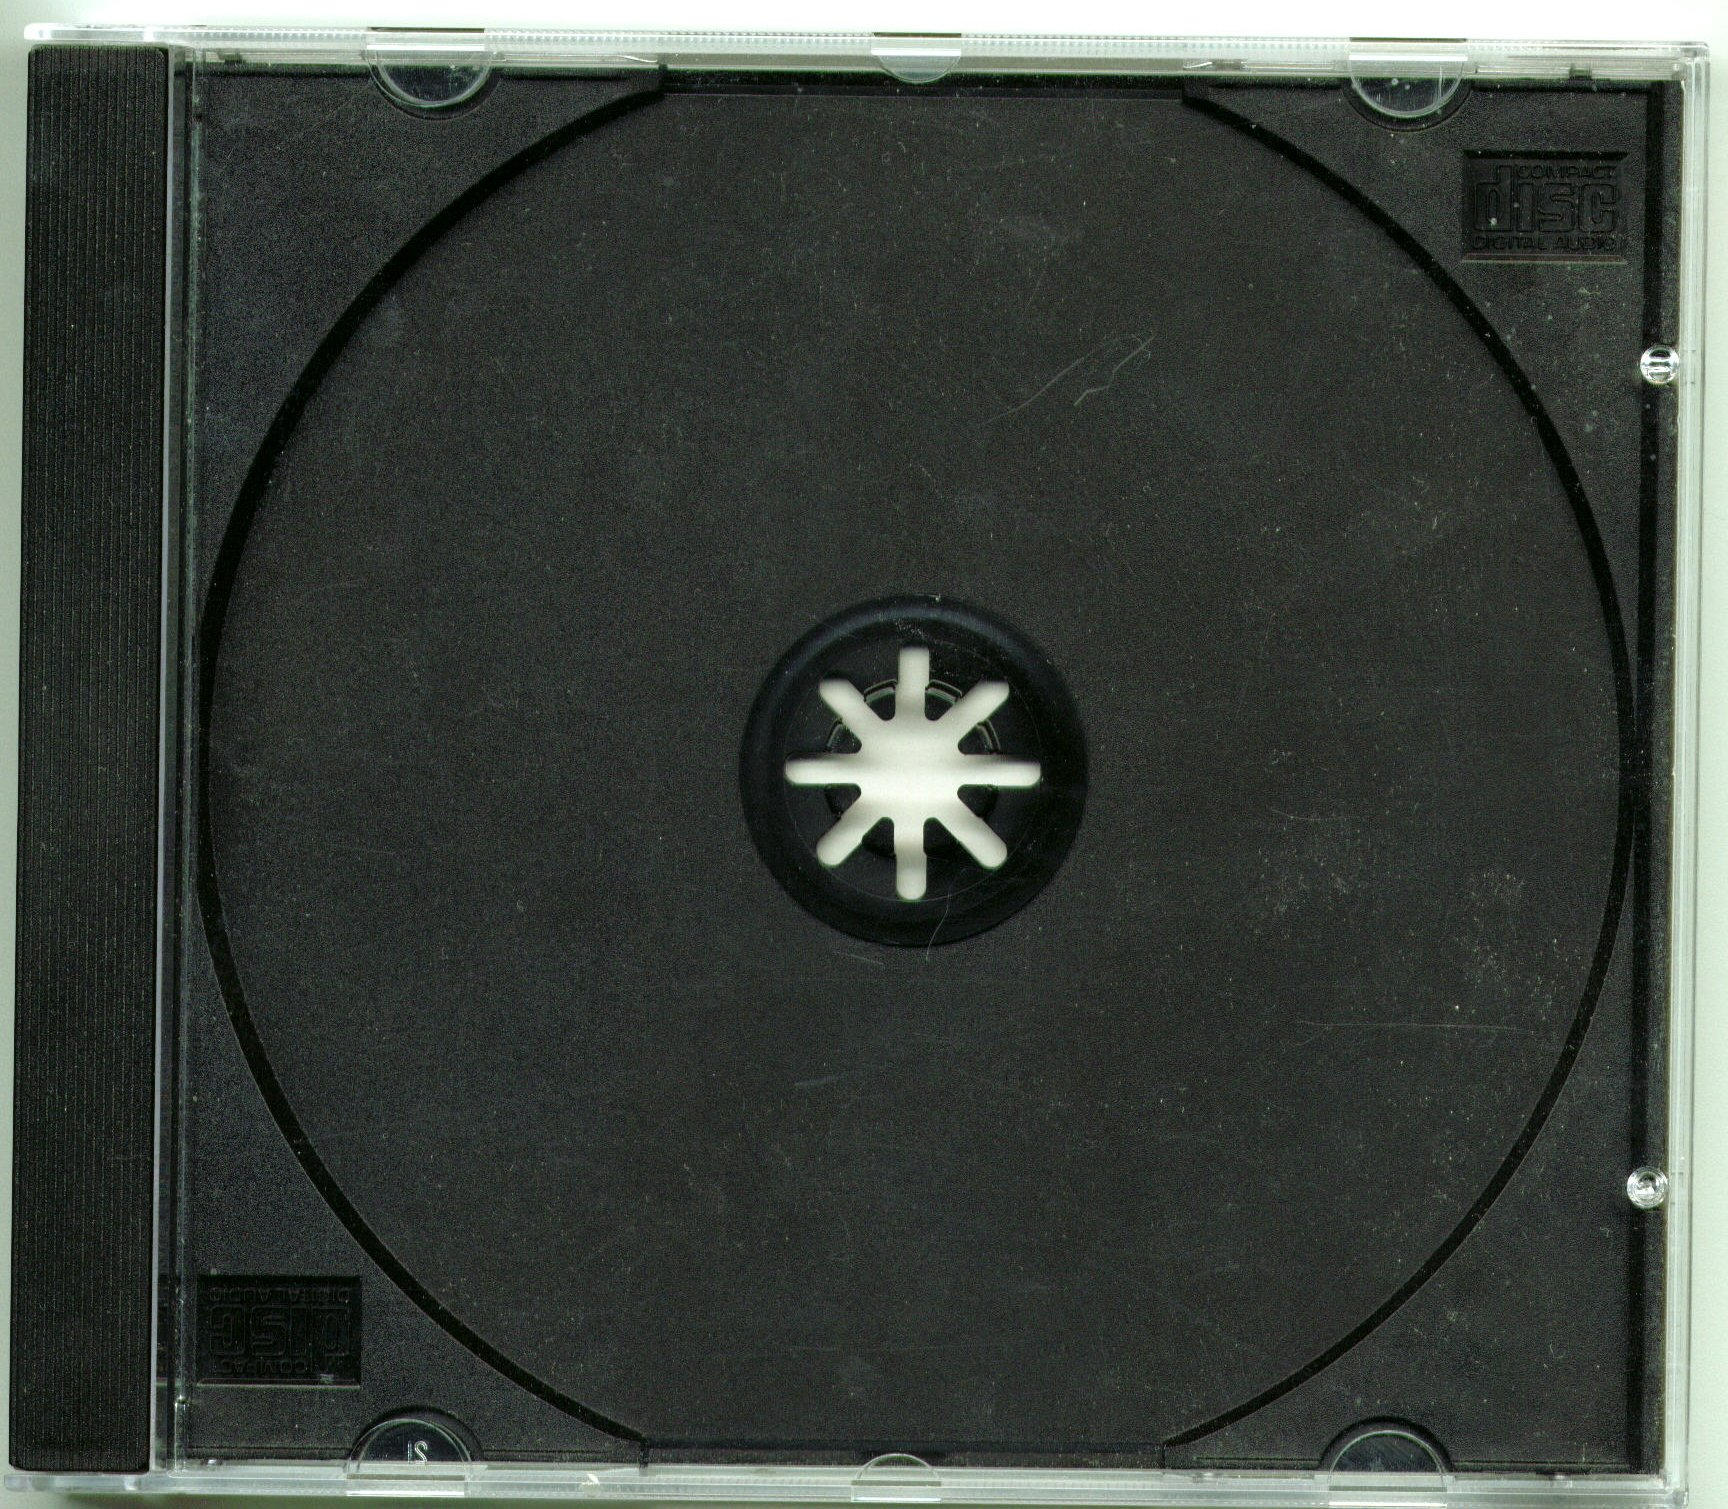 CD Jewel Case by emtilt-resource on DeviantArt